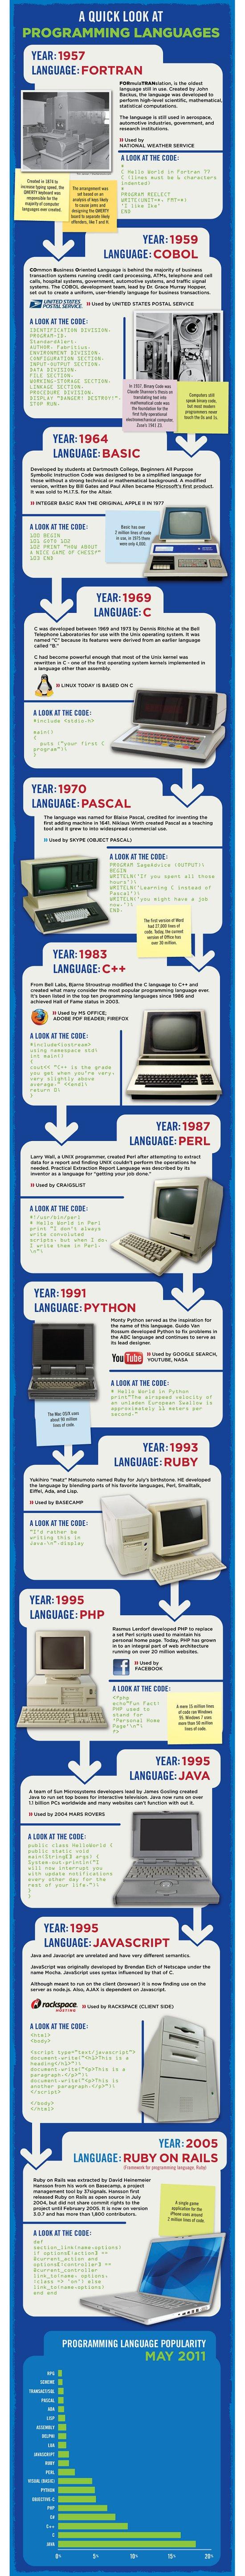 Actualidad Informática. Infografía historia lenguajes de programación. Rafael Barzanallana